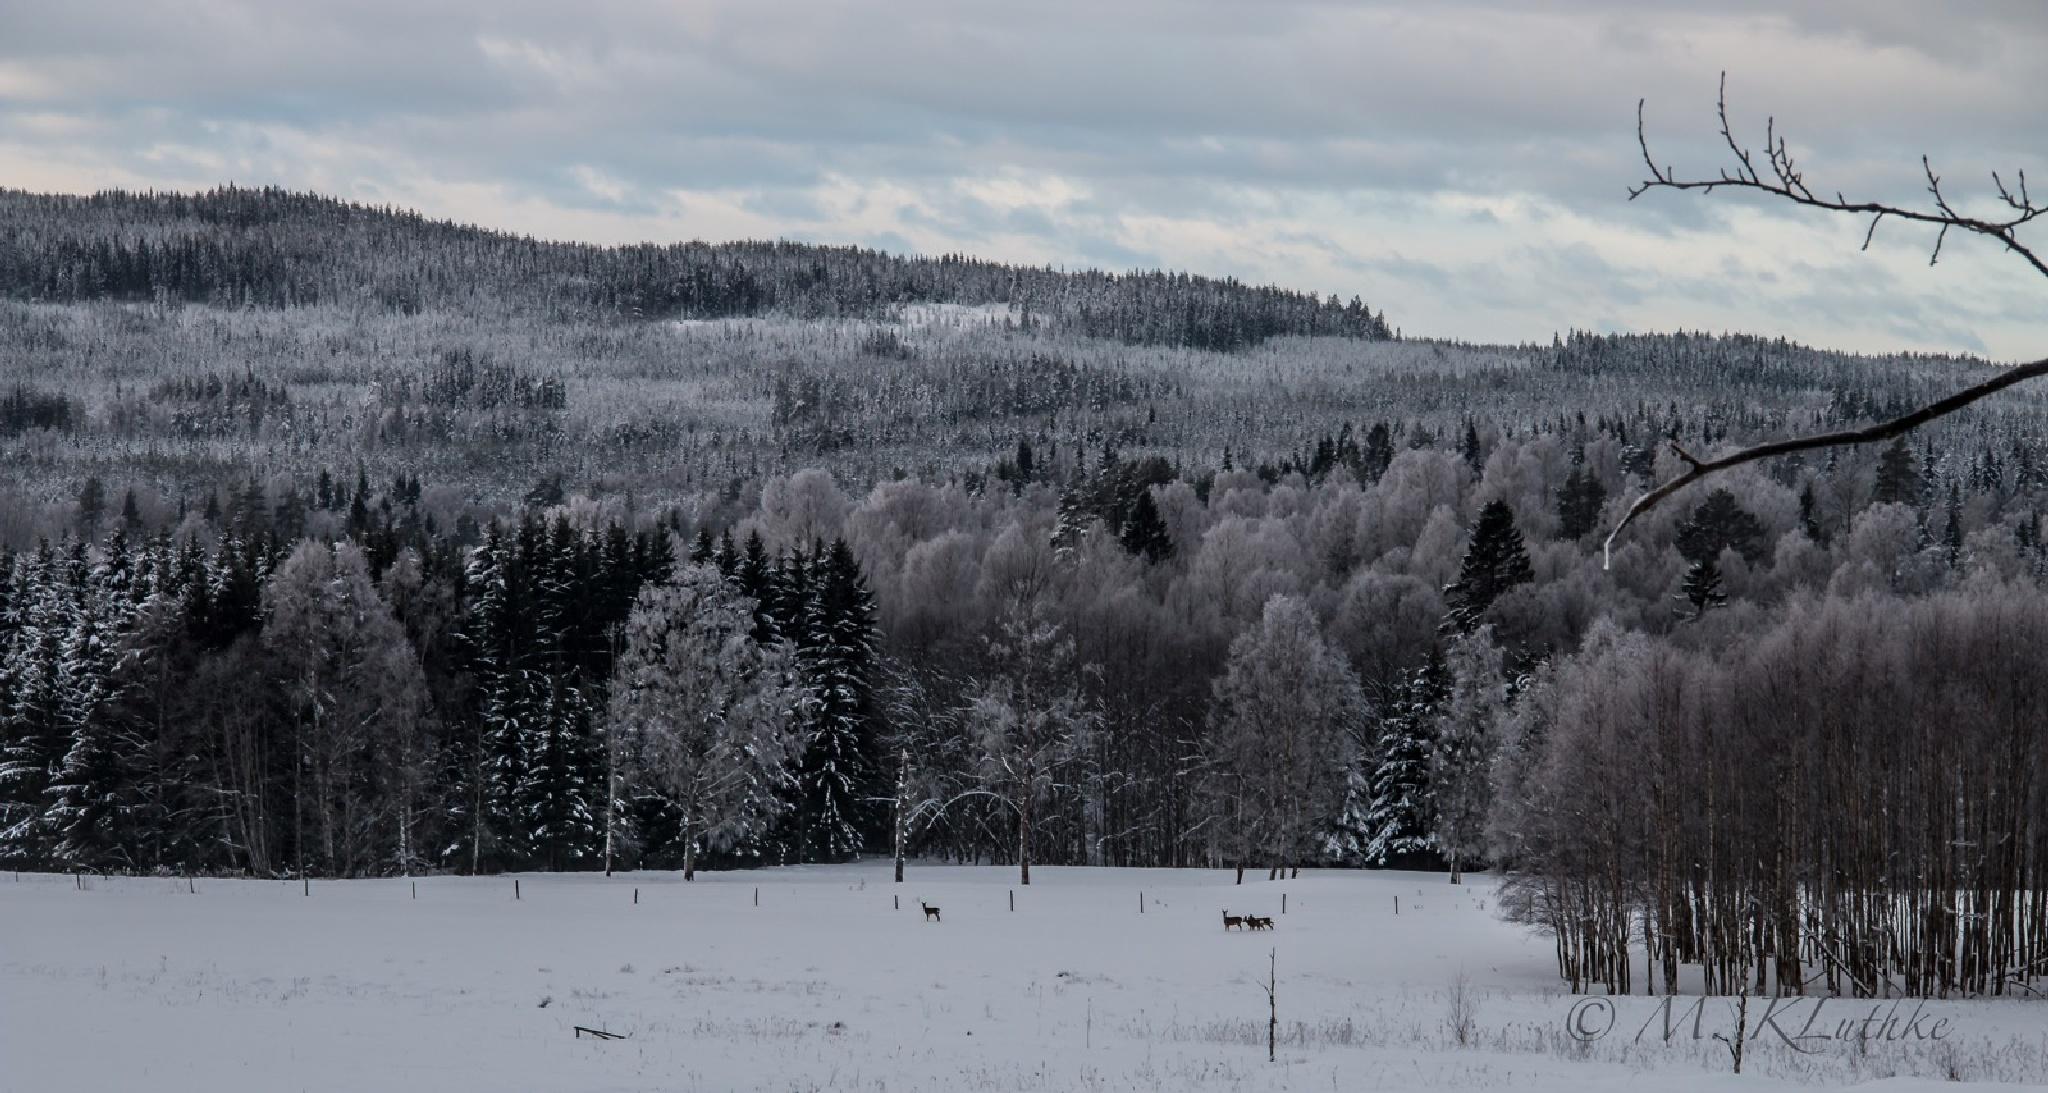 Rehe im Schnee / Rådjur i snö by Mrgit Kluthke